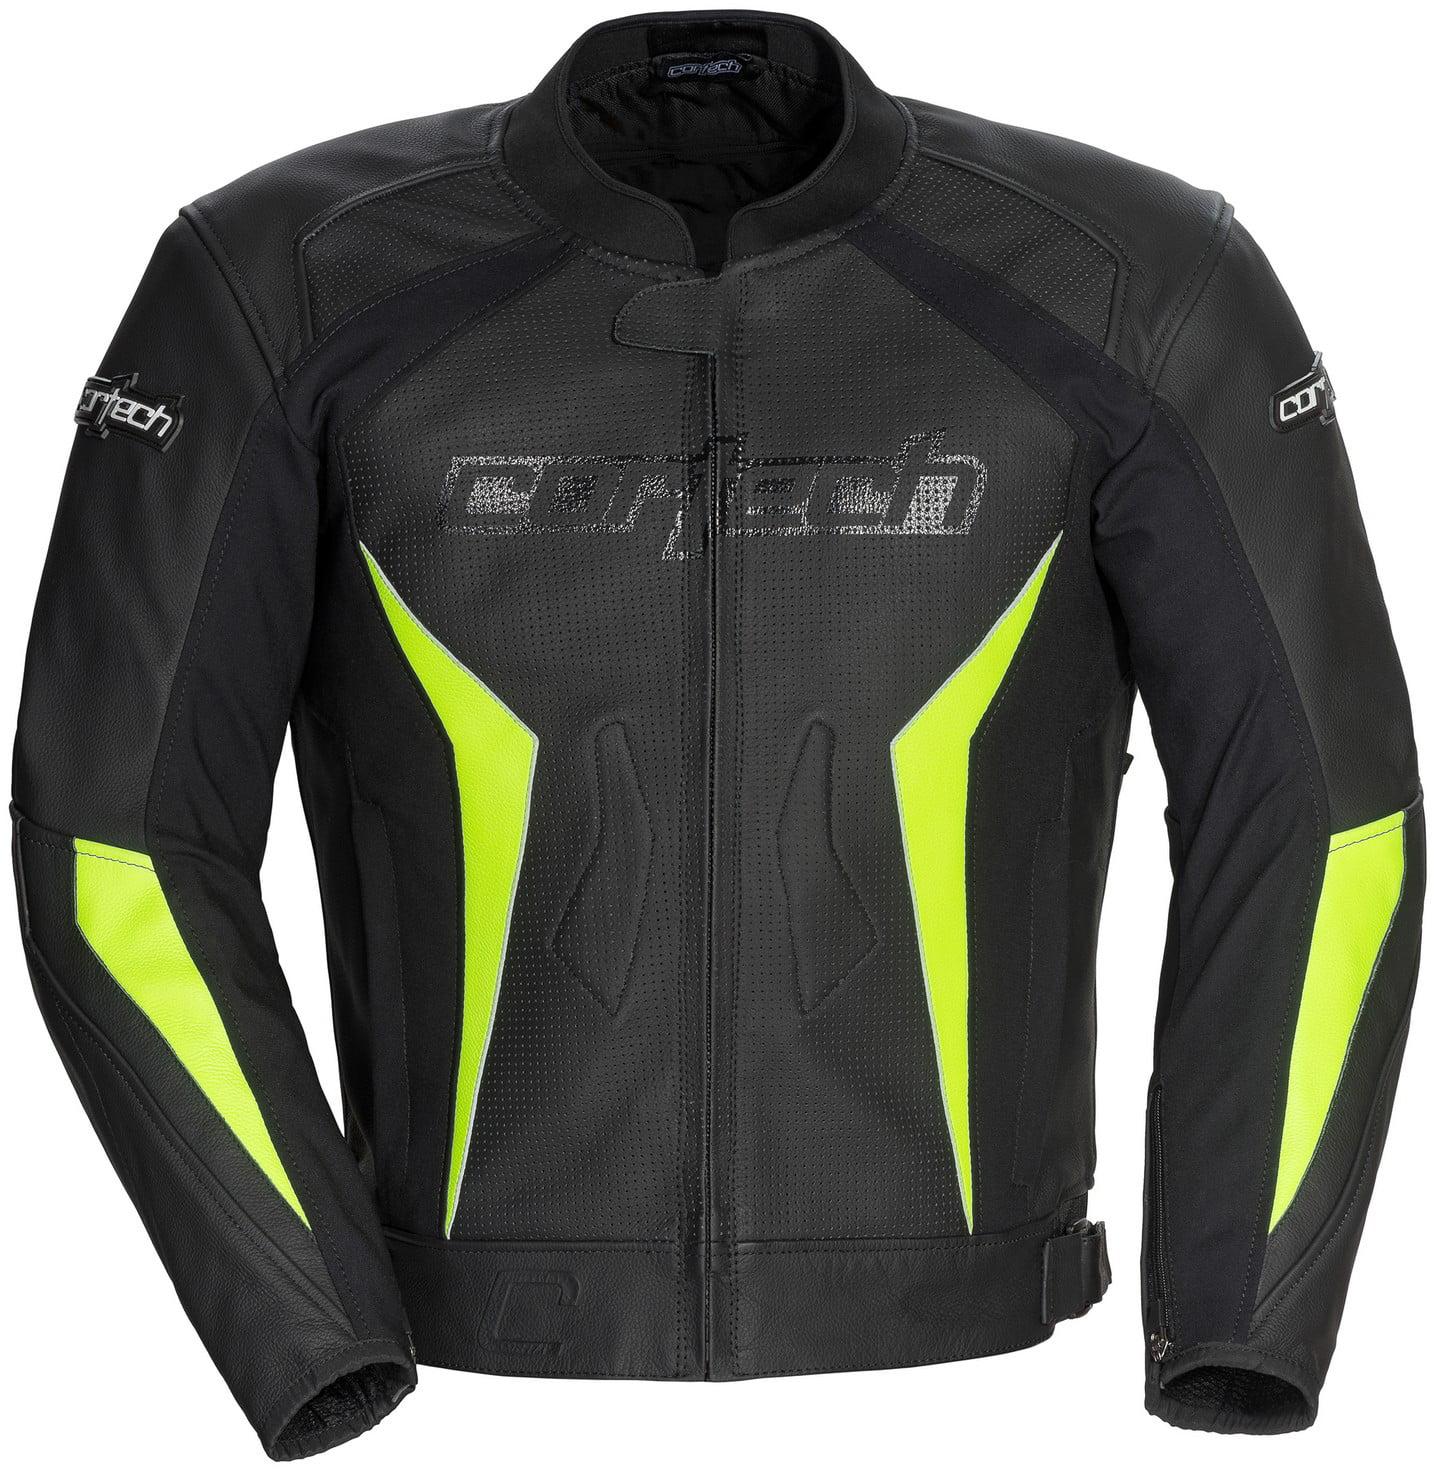 Cortech Latigo 2.0 Leather Jacket Black/Hi-Viz Yellow